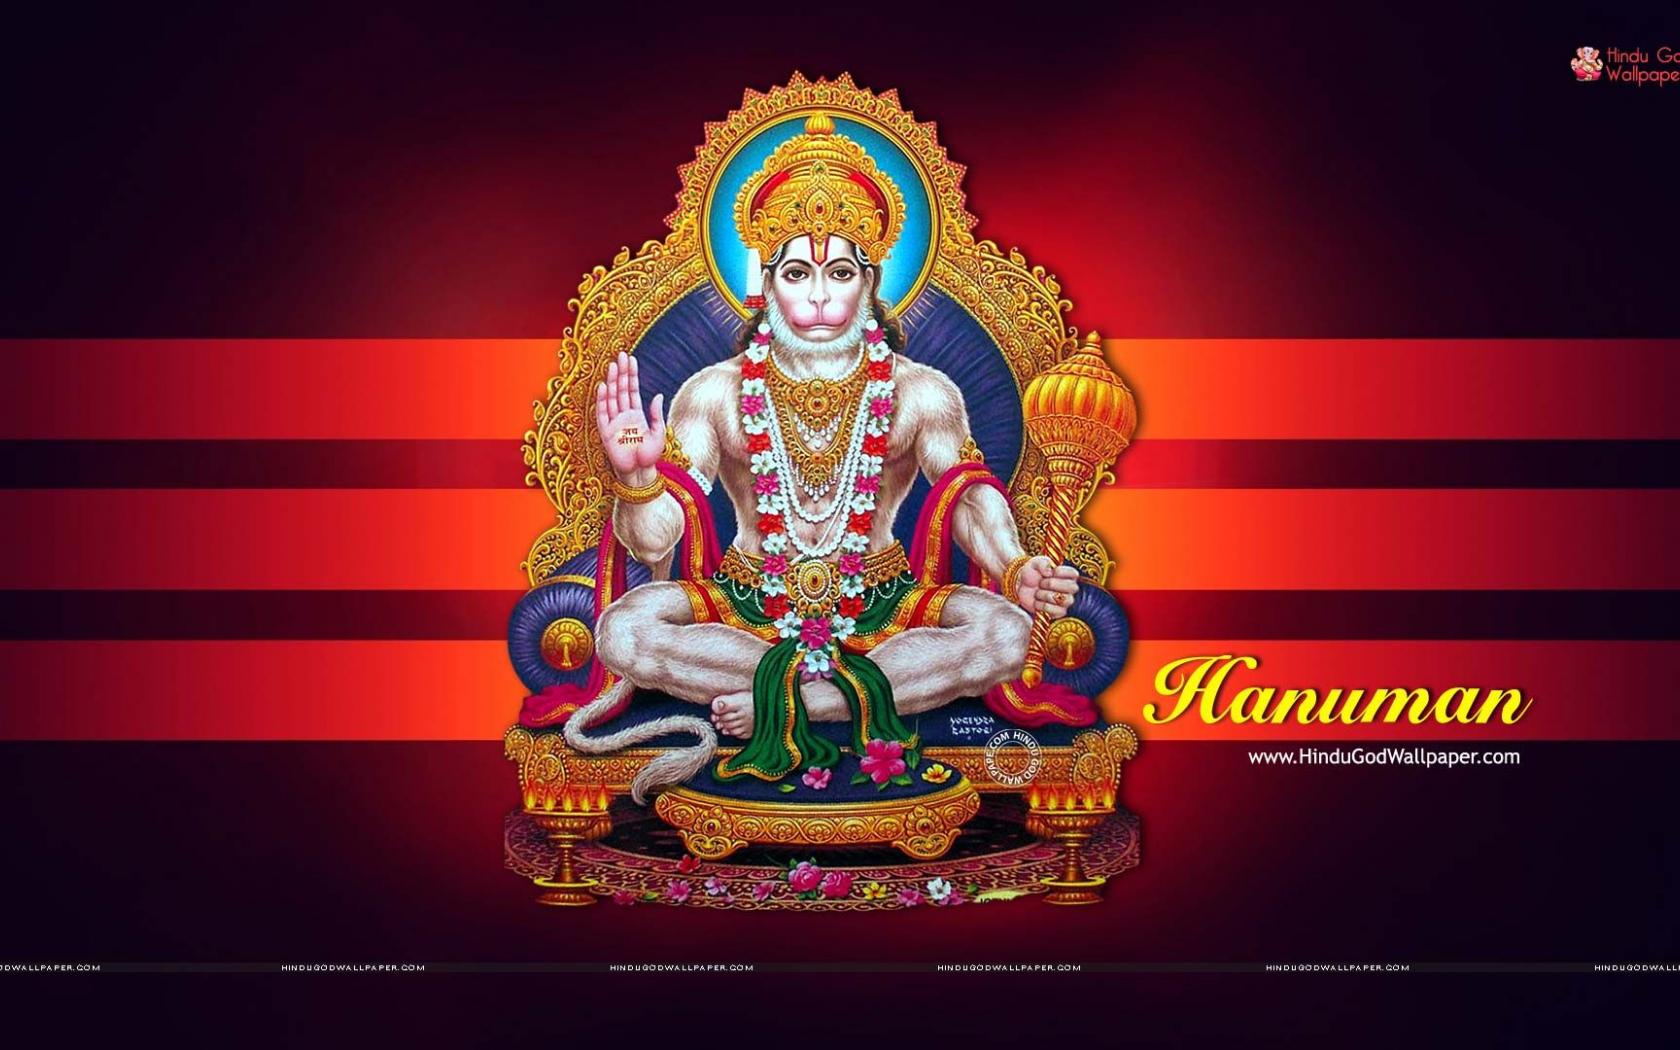 free download hanuman hd wallpaper full size god hanuman in 2019 hanuman hd 1920x1080 for your desktop mobile tablet explore 52 hinduism wallpapers hinduism wallpapers free download hanuman hd wallpaper full